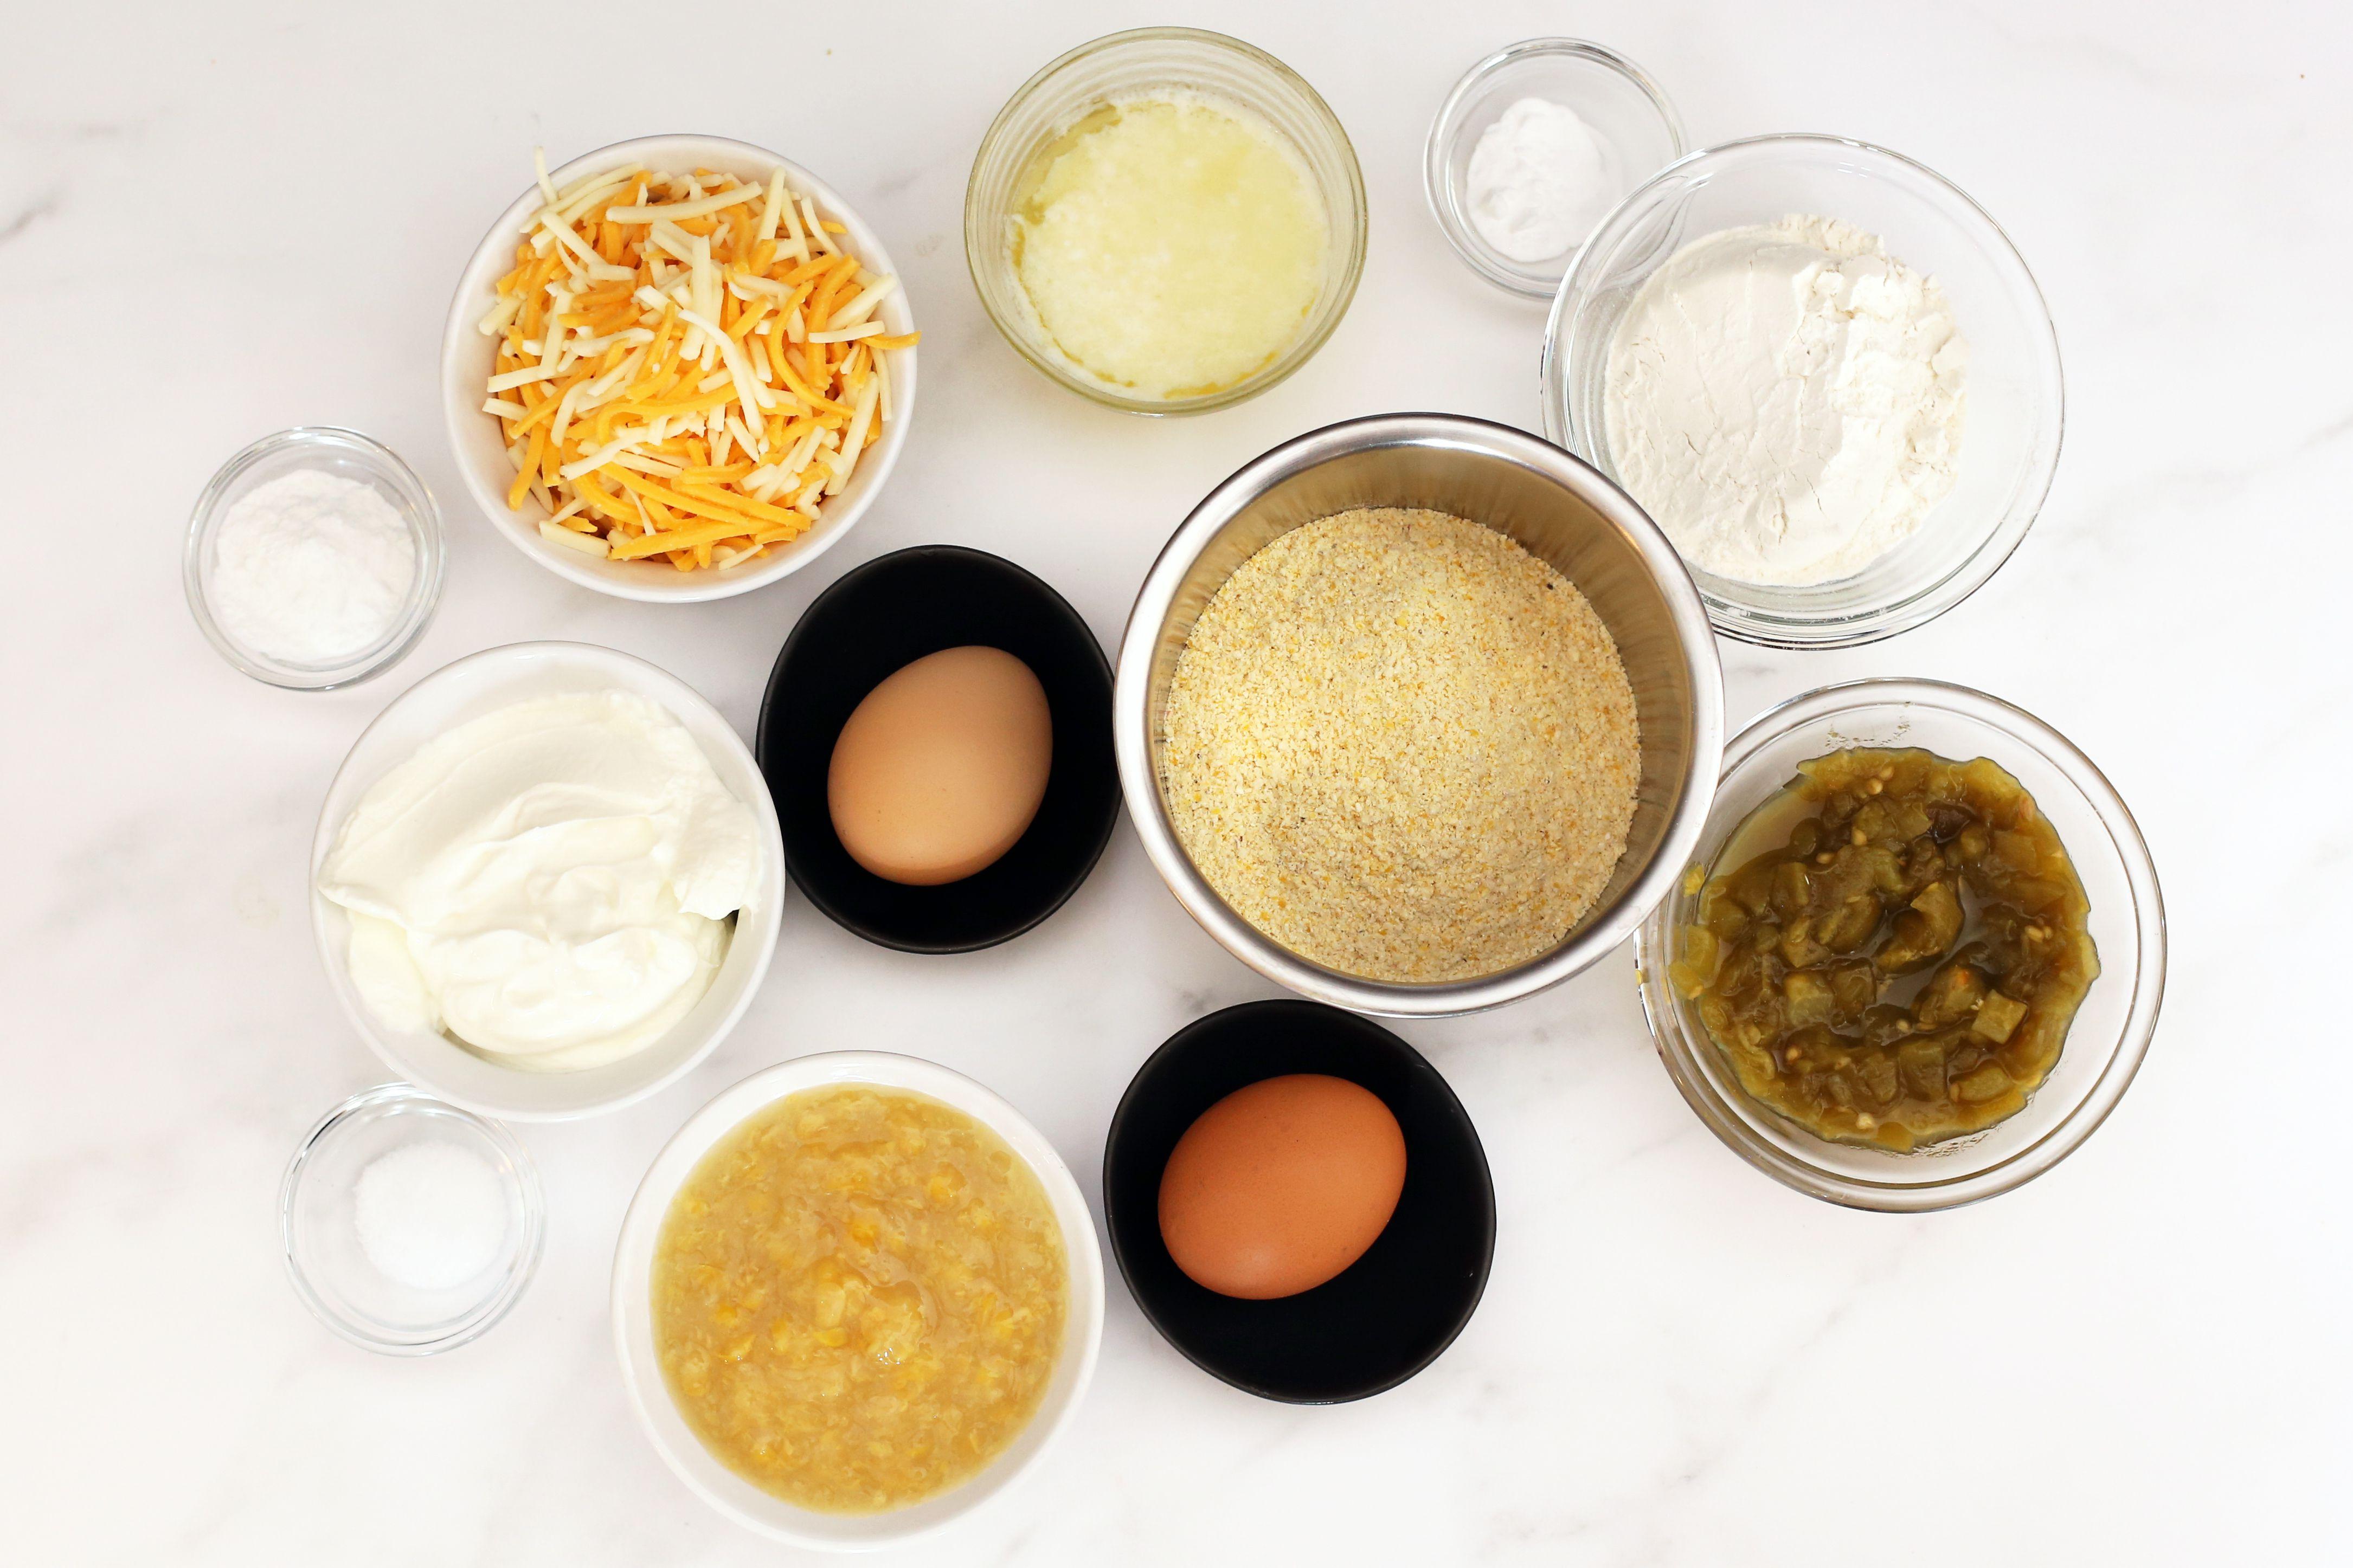 Mexican cornbread ingredients.